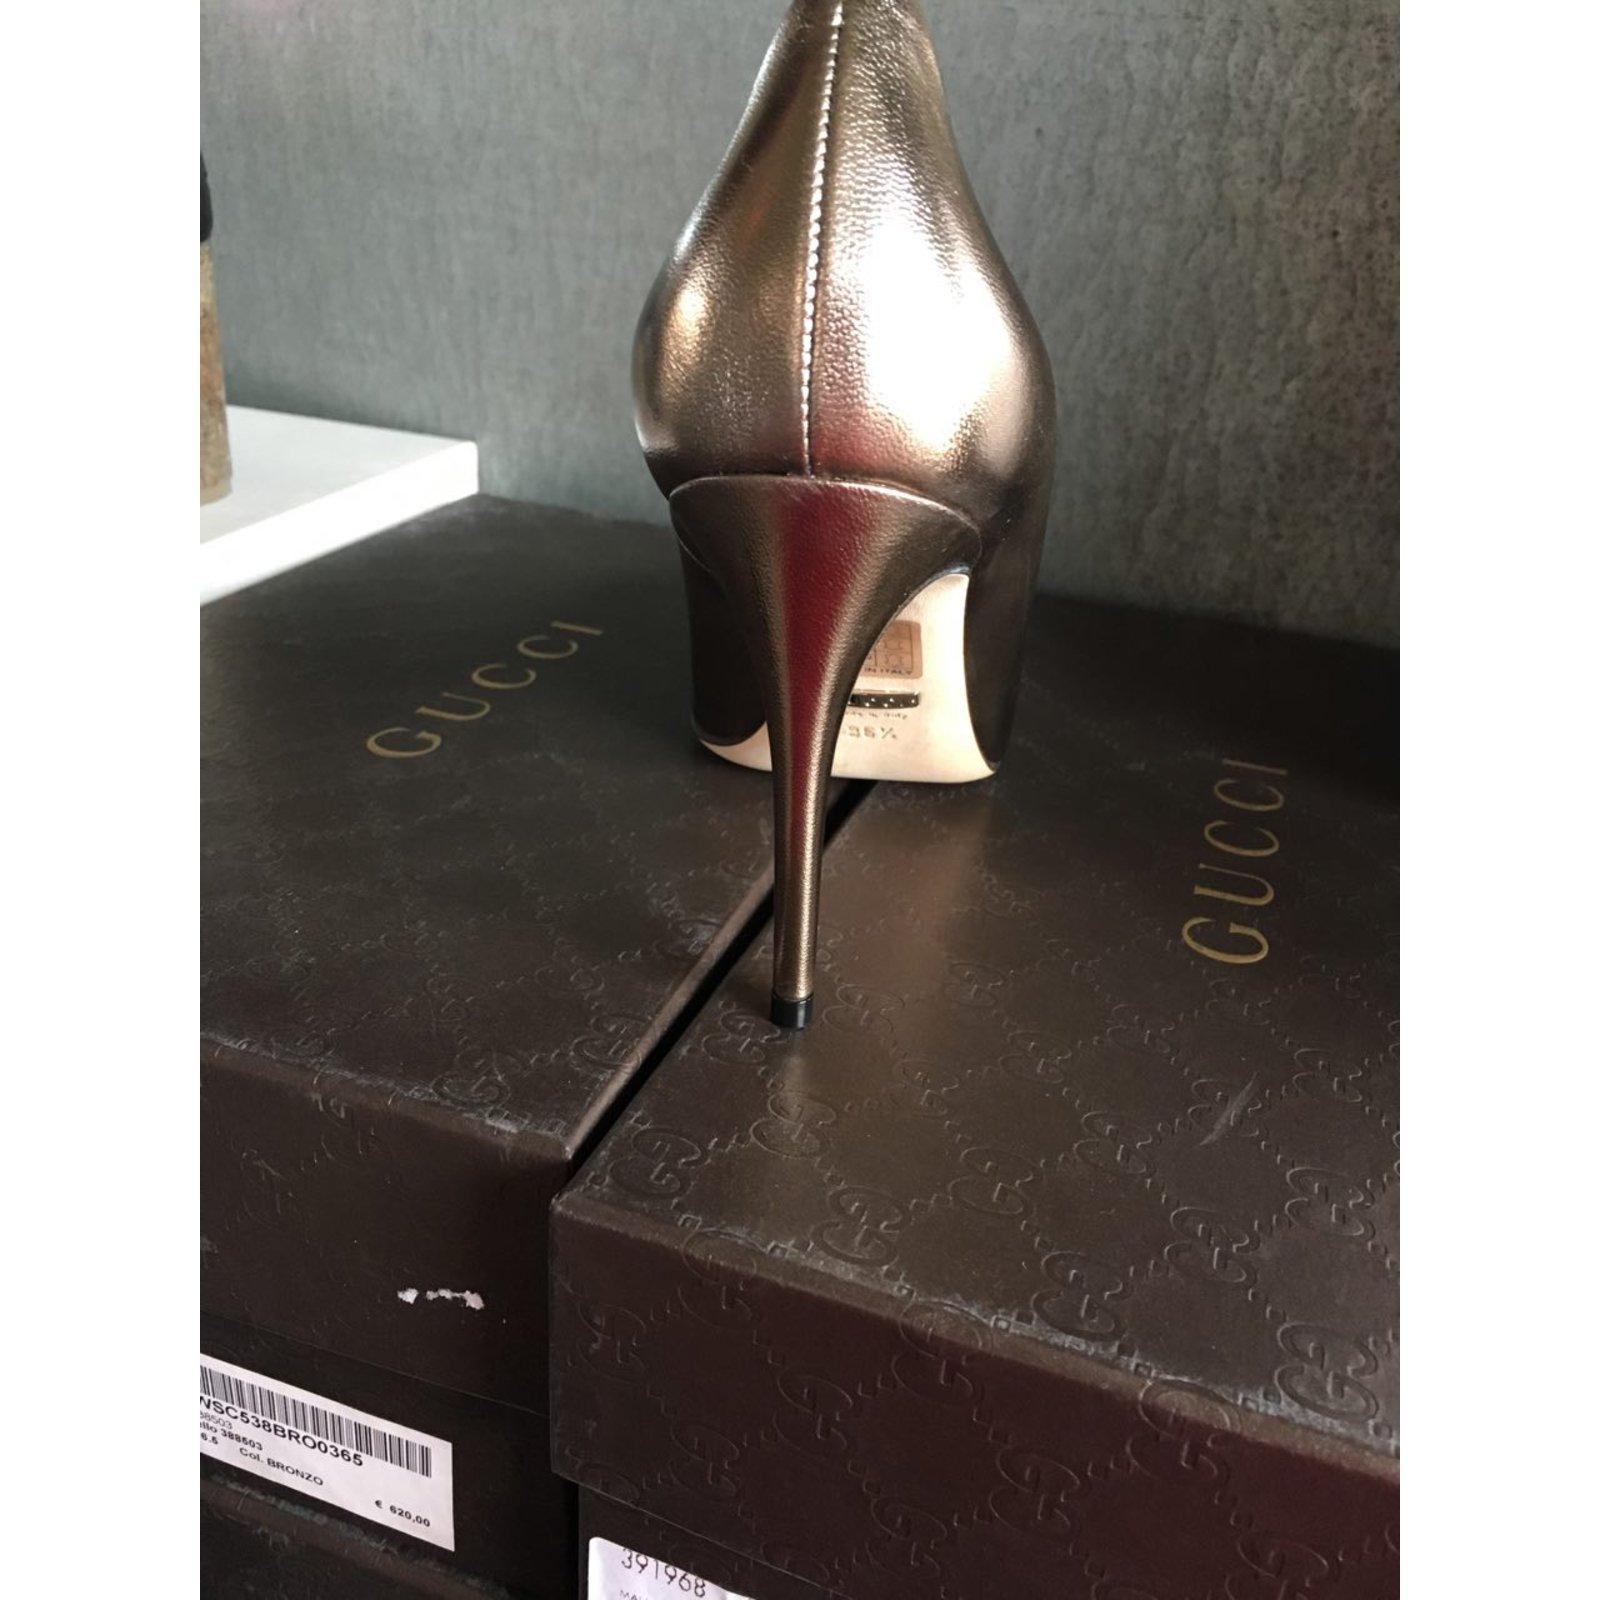 e196adf9b Gucci gucci pumps size 36,5 new Heels Leather Other ref.50442 - Joli Closet